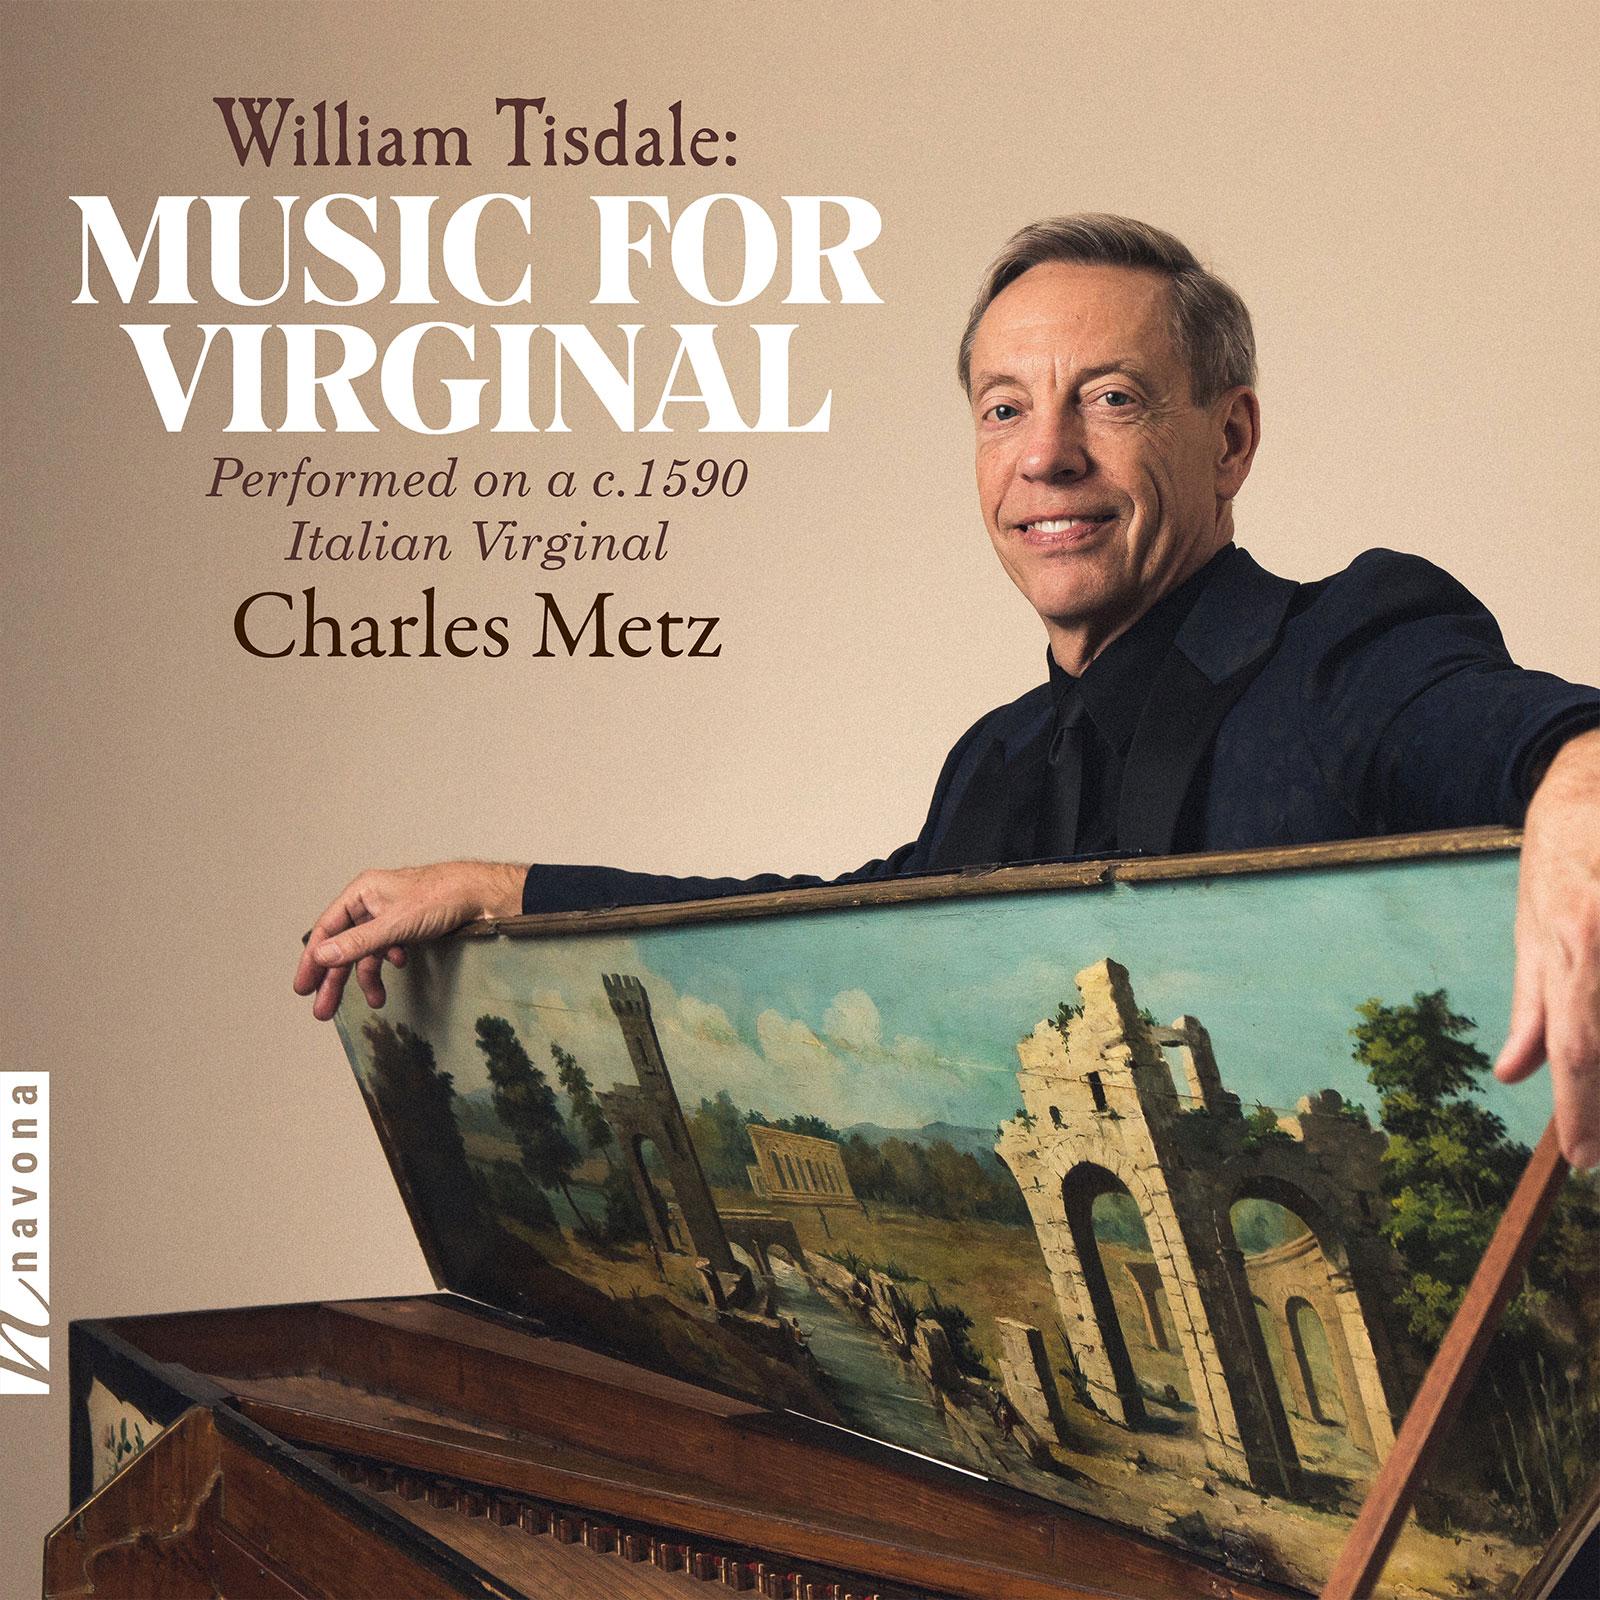 WILLIAM TISDALE: MUSIC FOR VIRGINAL - Charles Metz - Album Cover